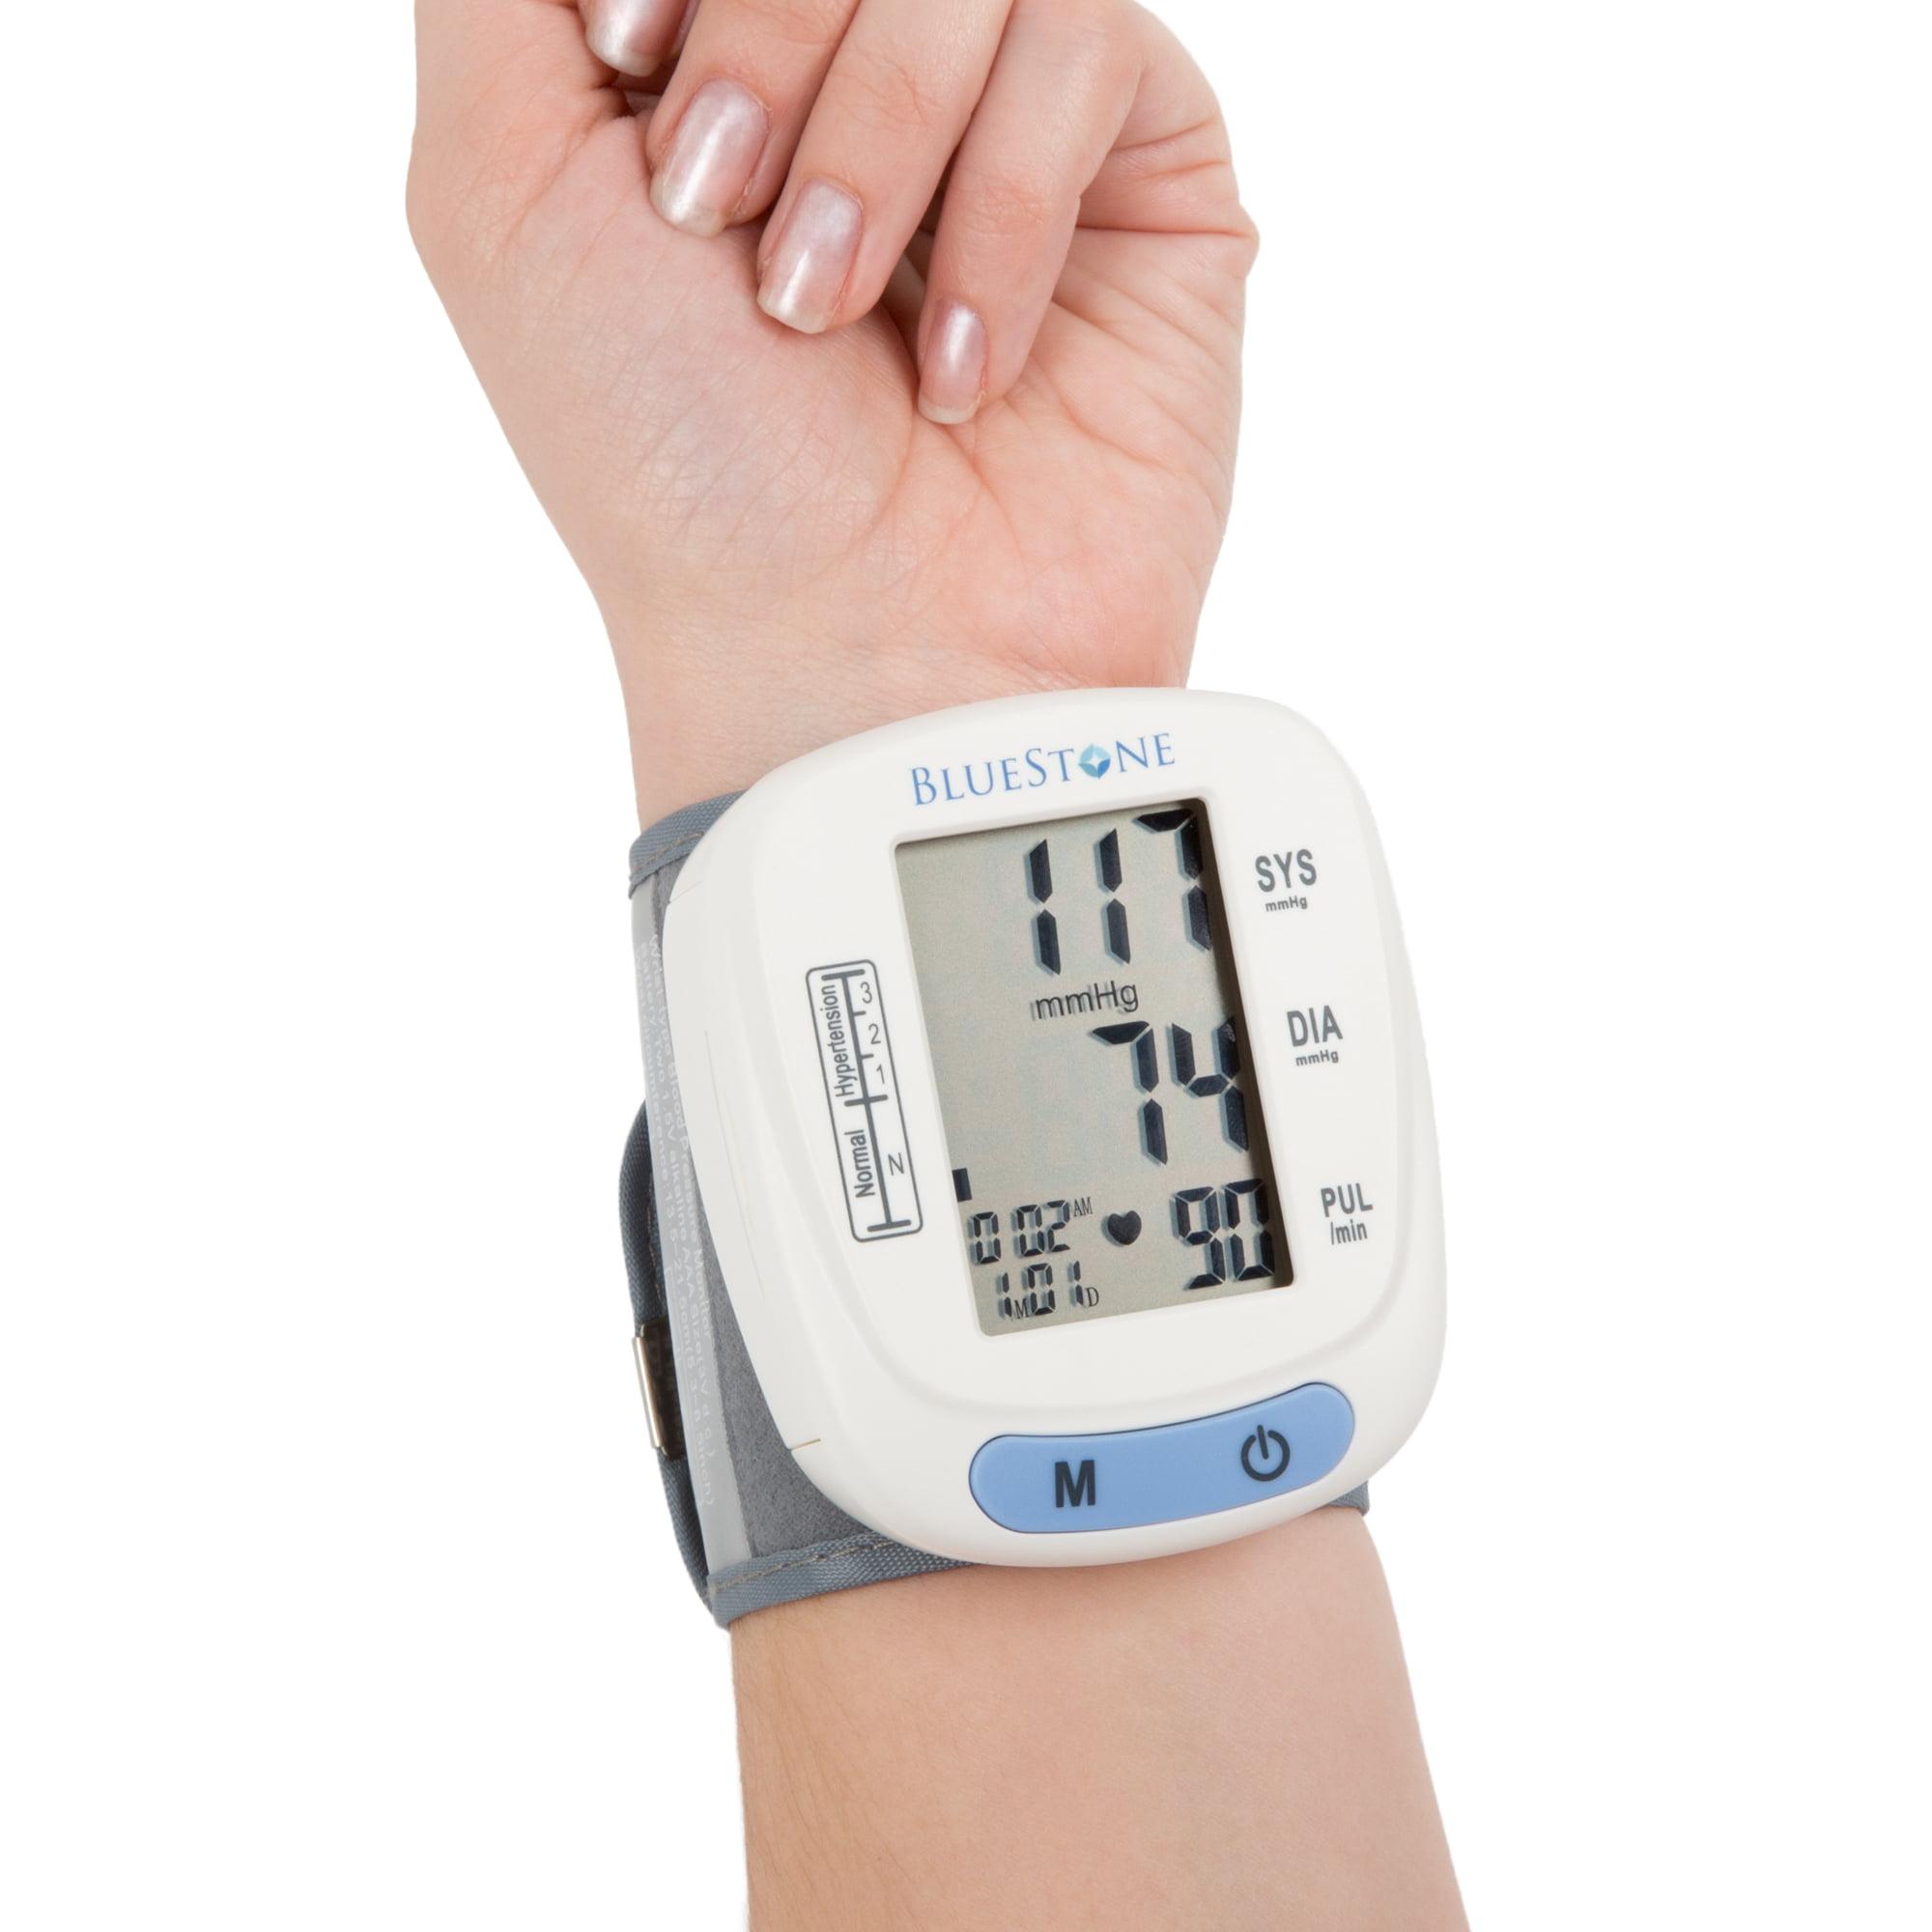 Bluestone Automatic Wrist Blood Pressure Monitor with 120 Memory